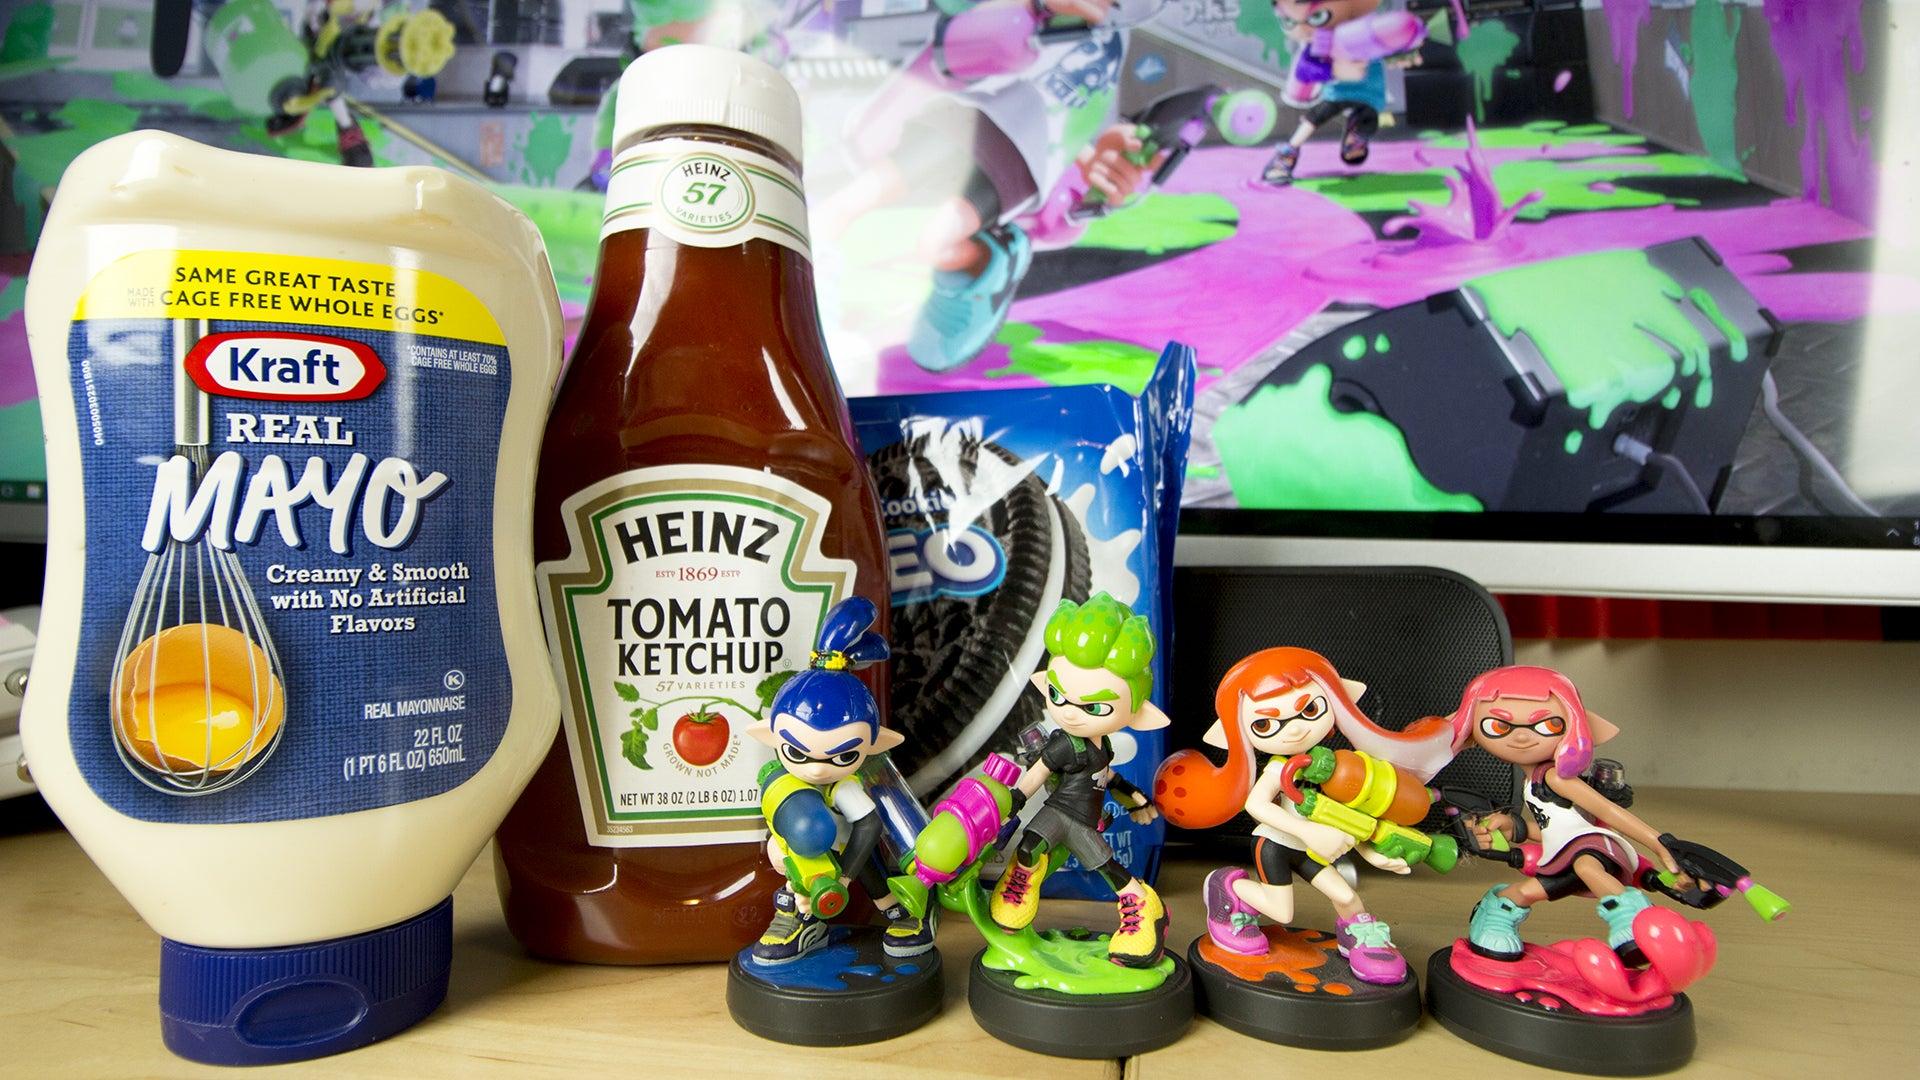 Aioli Splatoon let's settle splatoon's mayo vs. ketchup war, with science